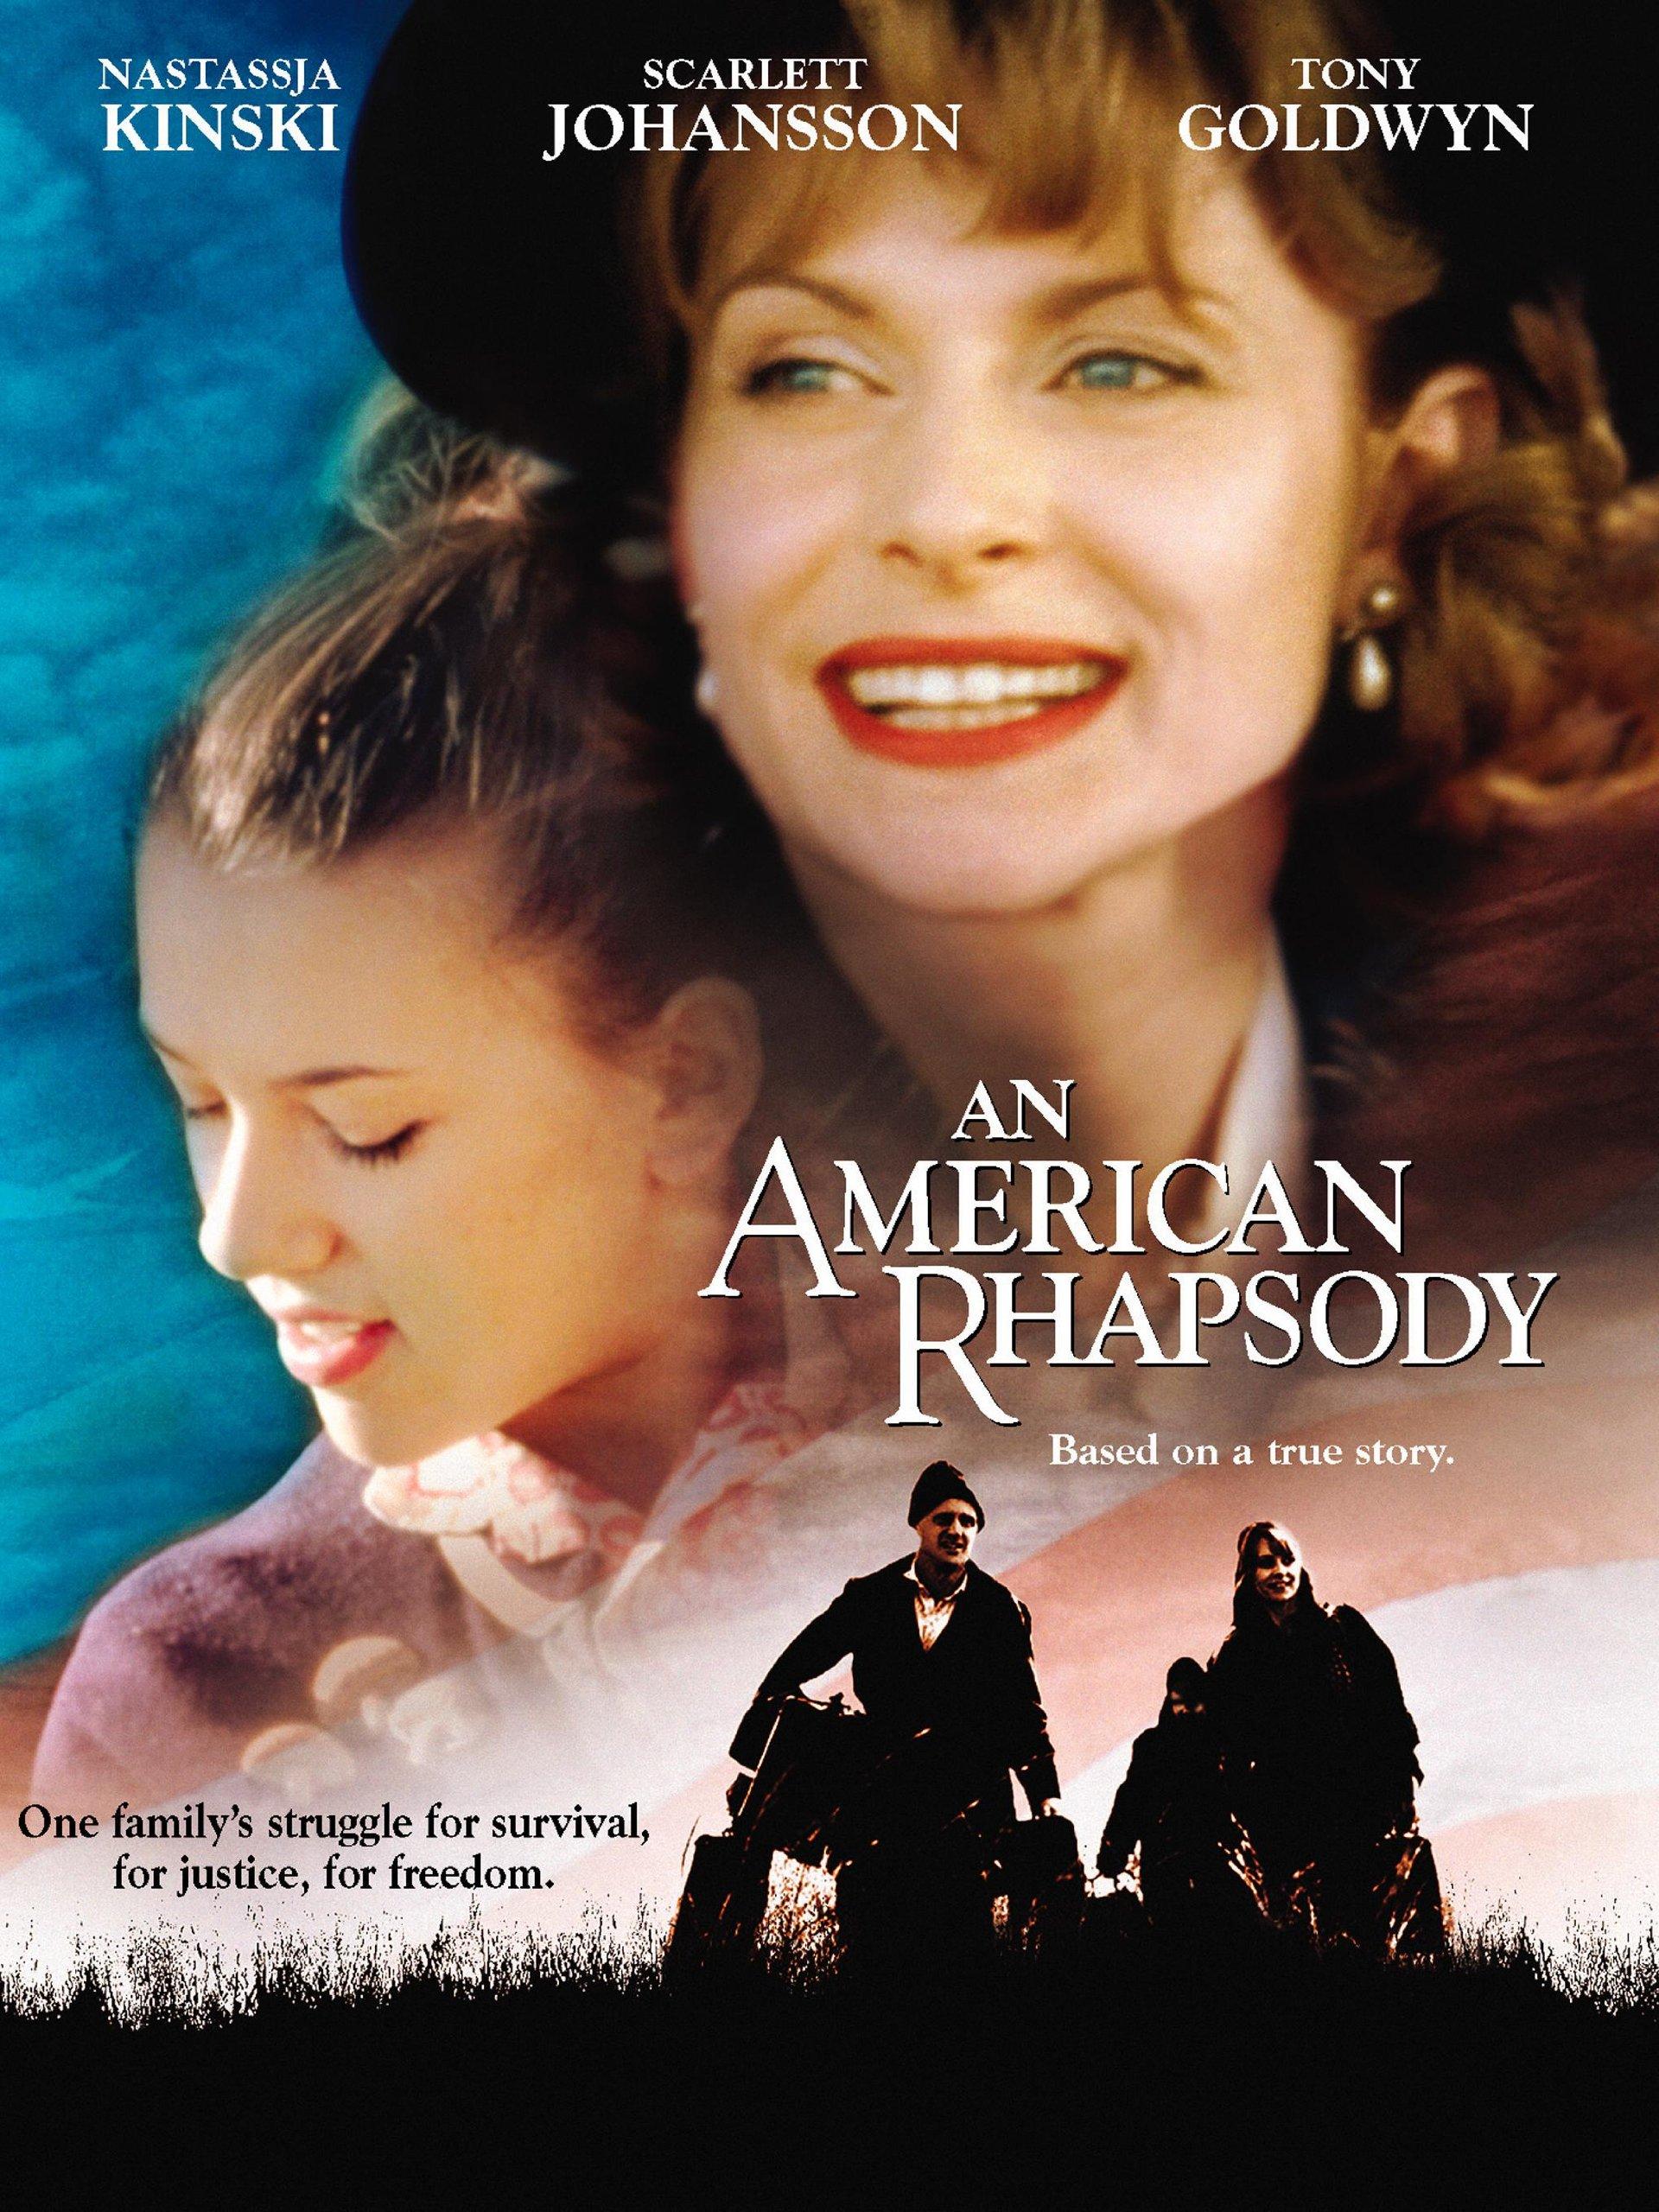 In fuga per la libertà con Scarlett Johansson e Nastassja Kinski | Tv2000  DocFilm